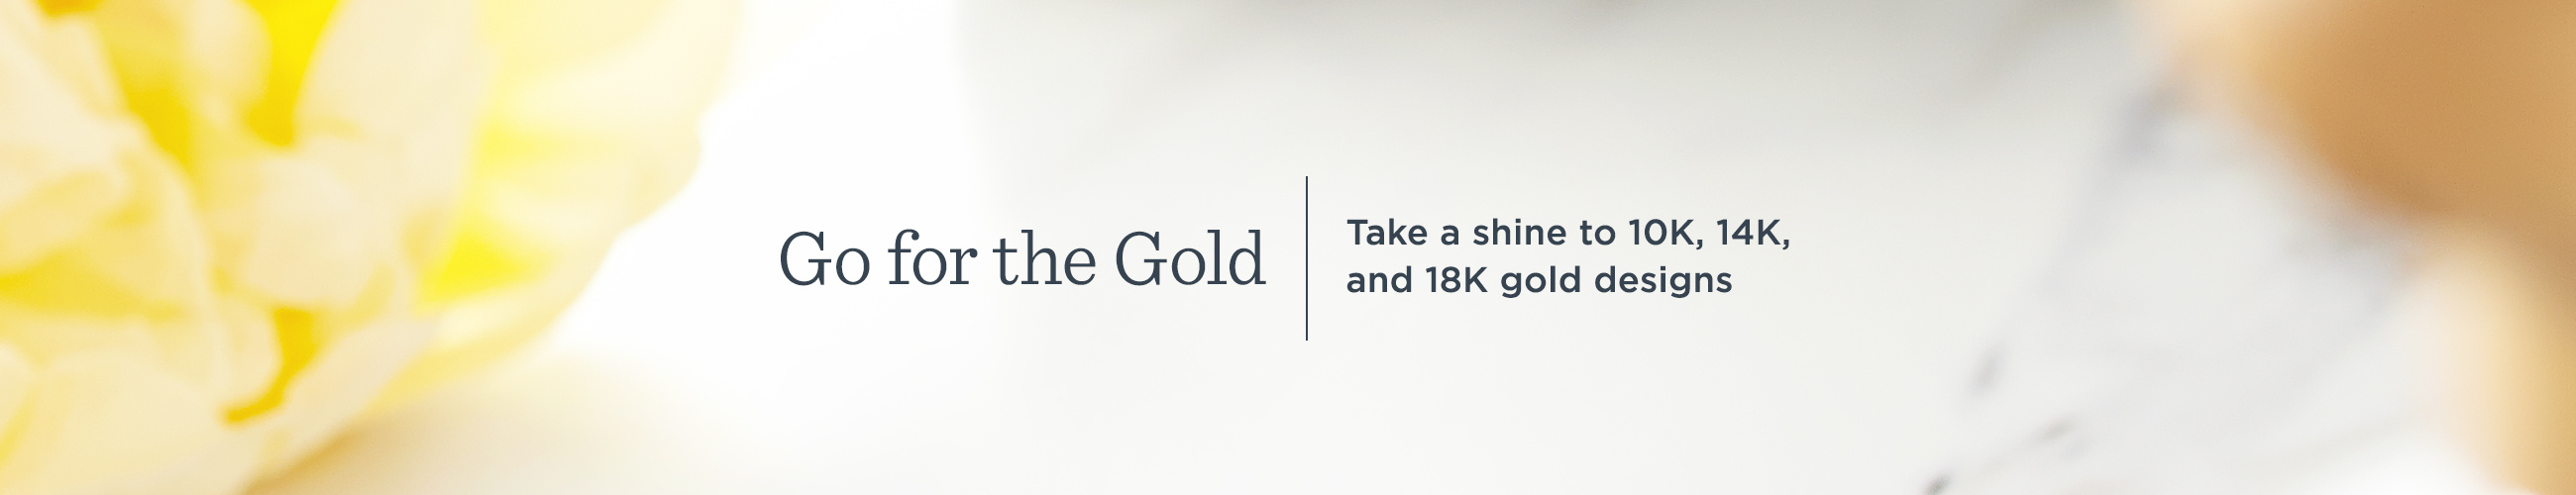 Go for the Gold — Take a shine to 10K, 14K, and 18K gold designs